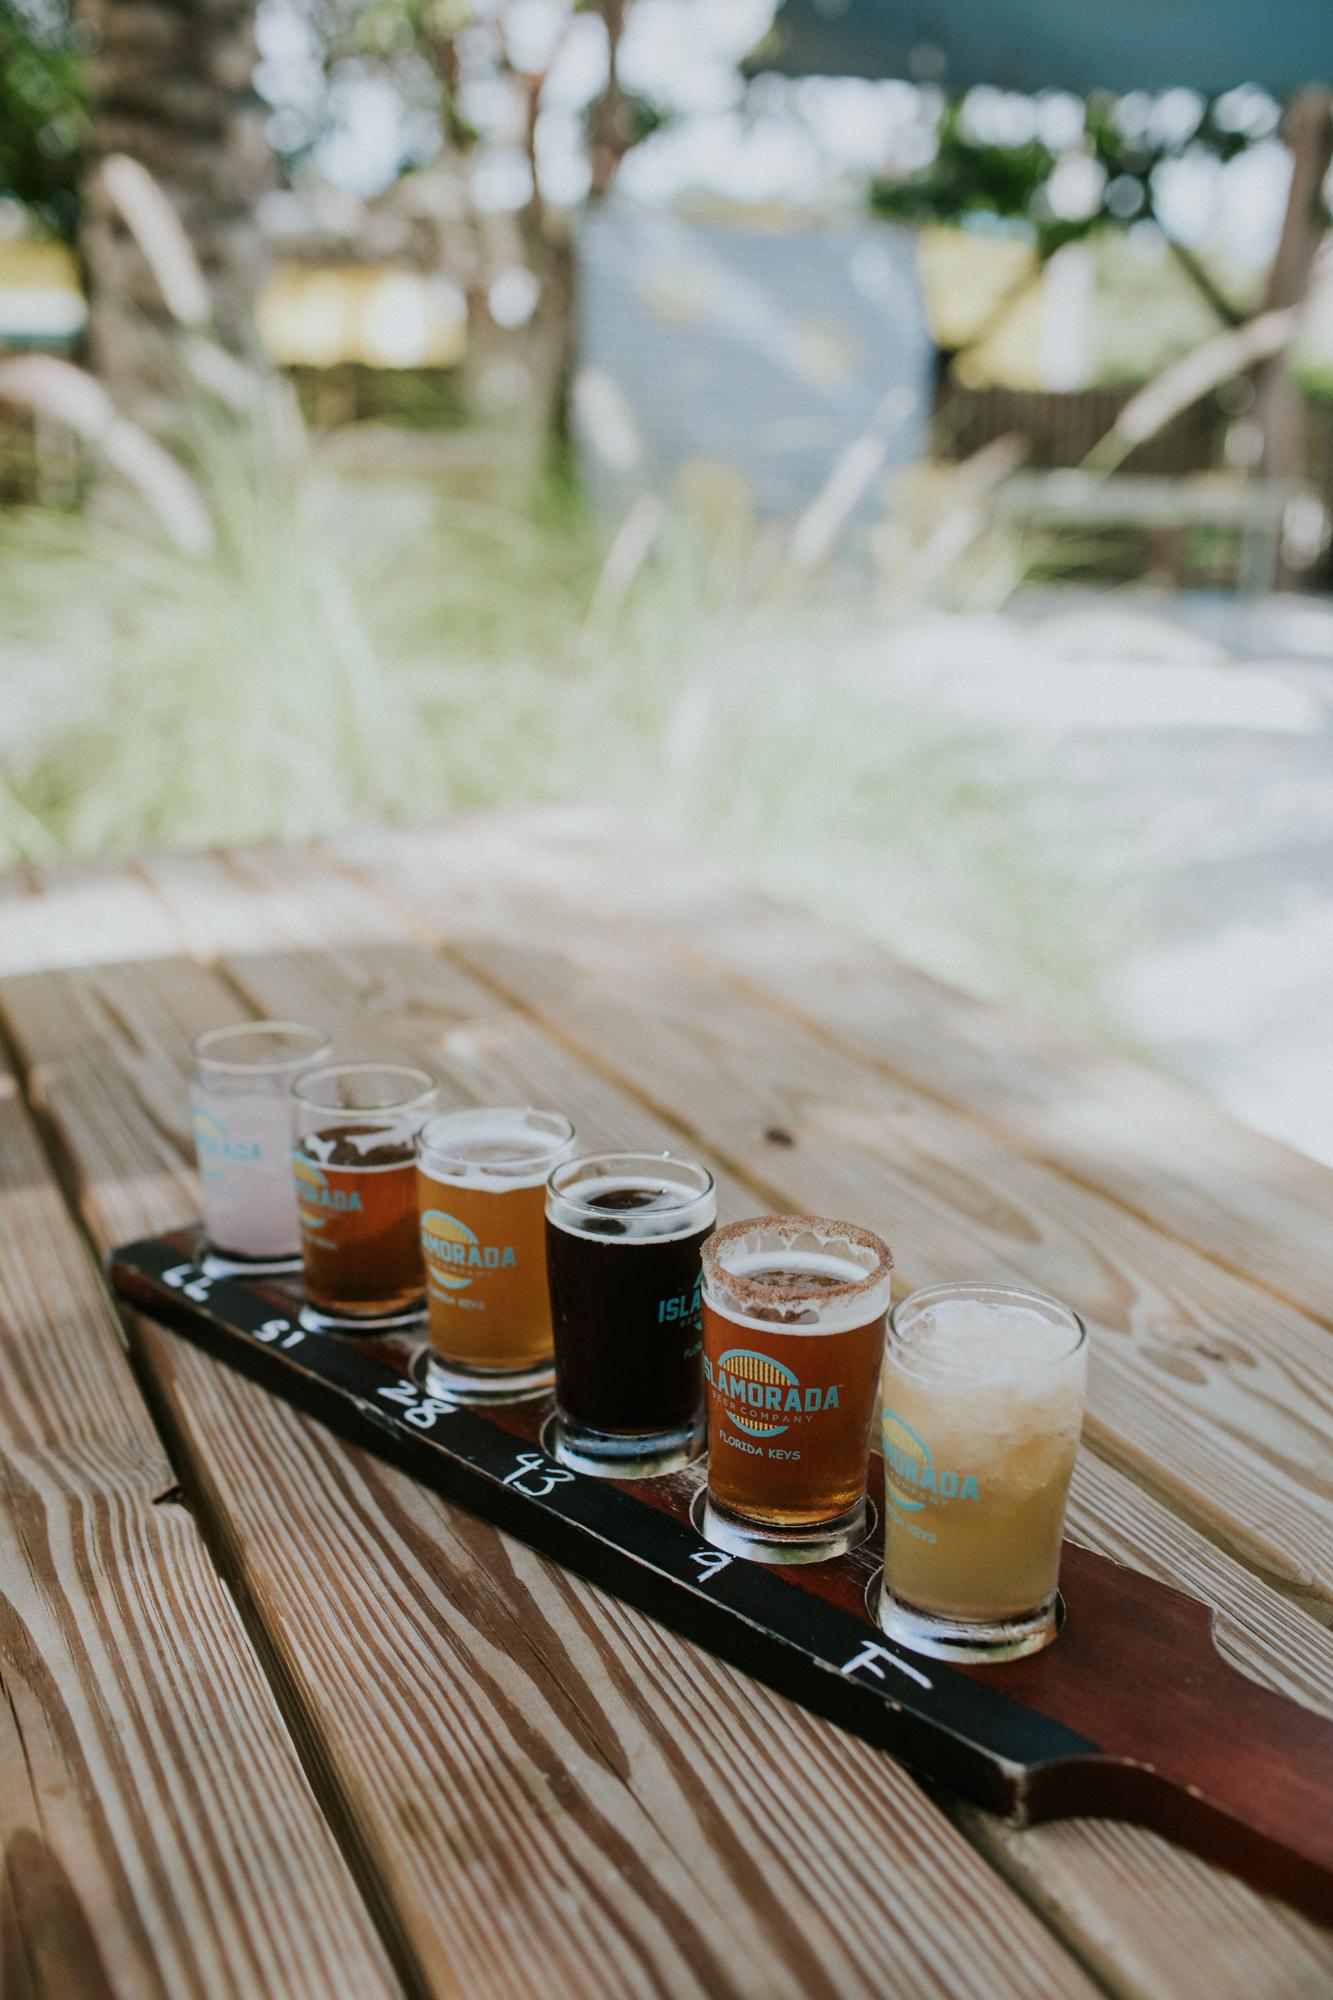 islamorada brew company